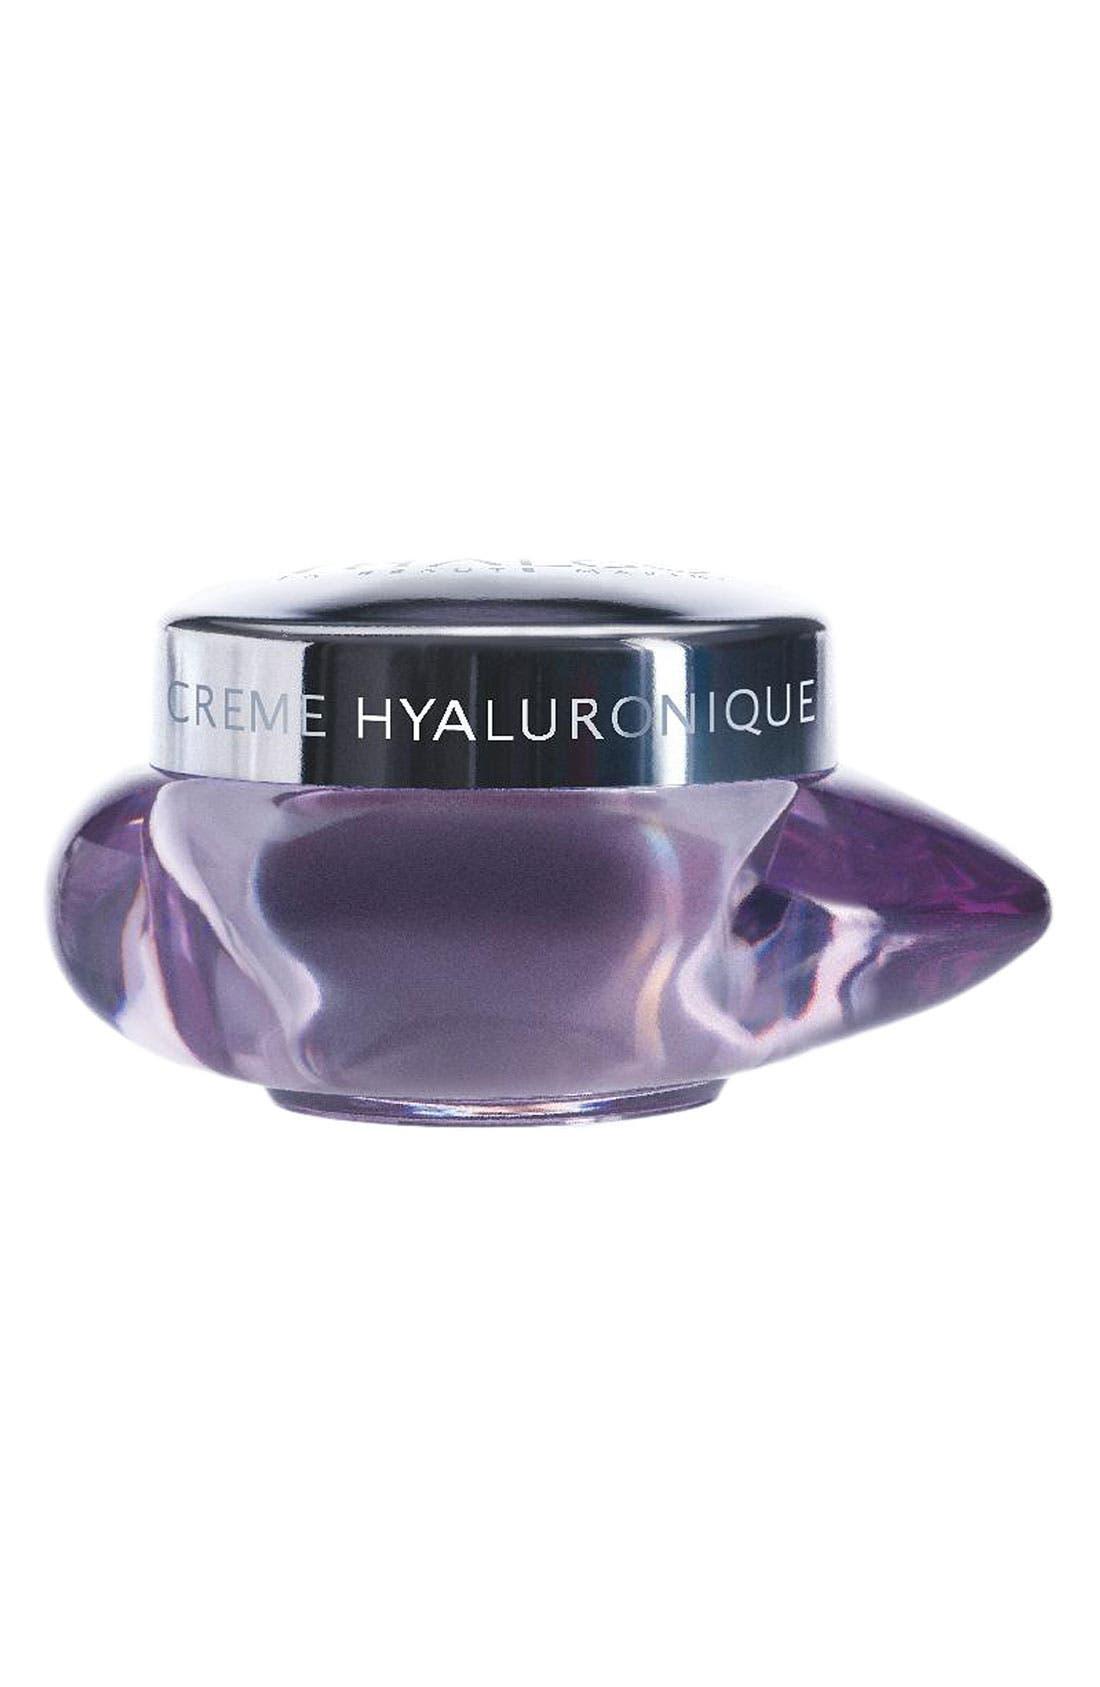 Thalgo 'Hyaluronic' Cream